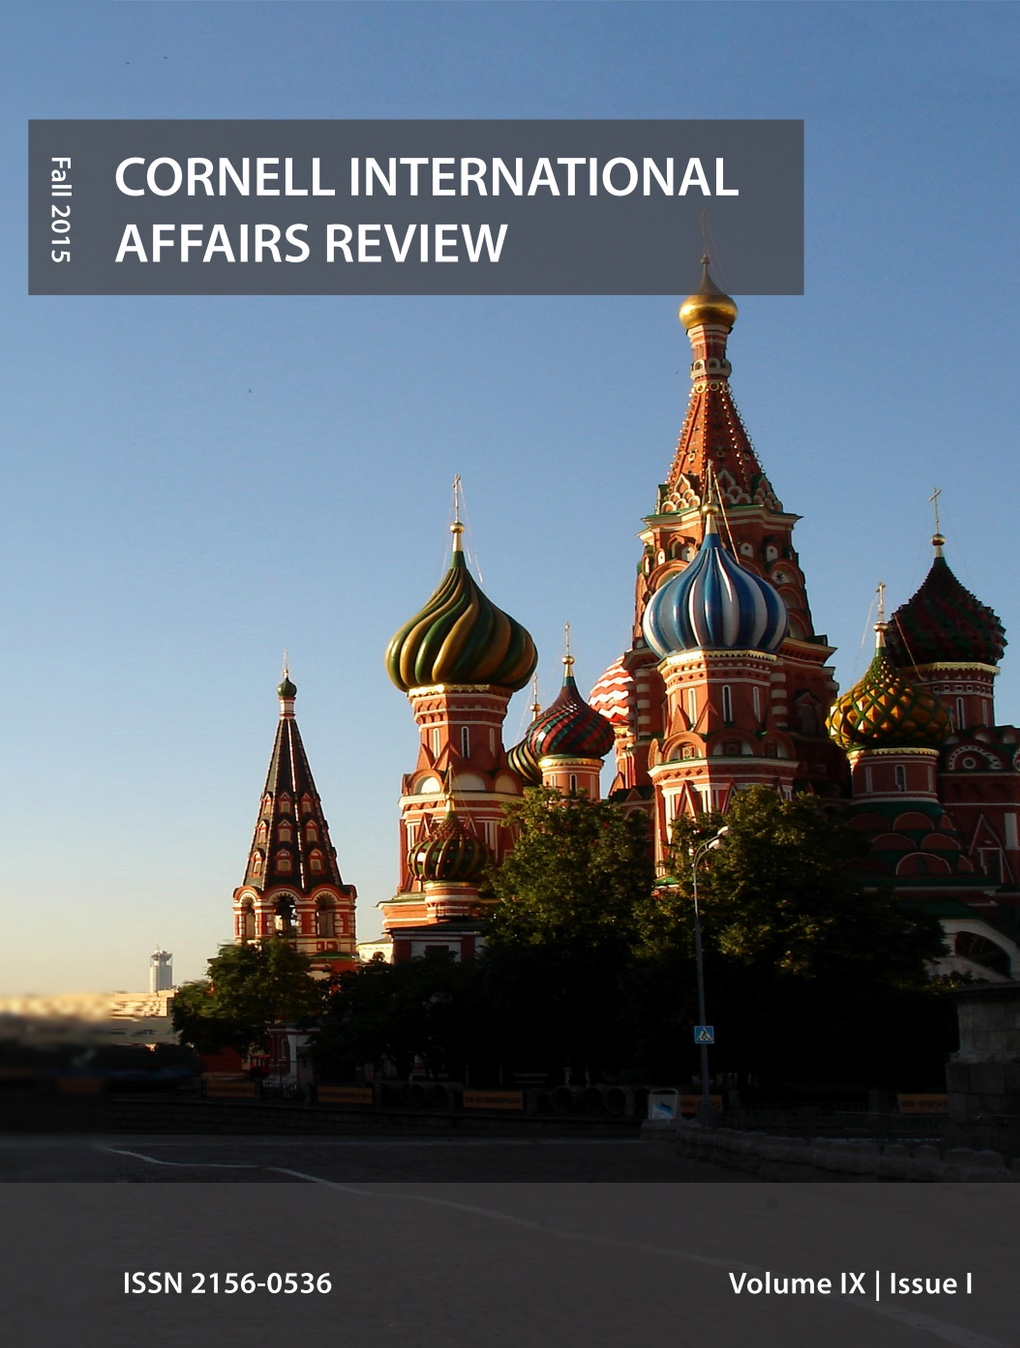 International Relations academic advantage complaints